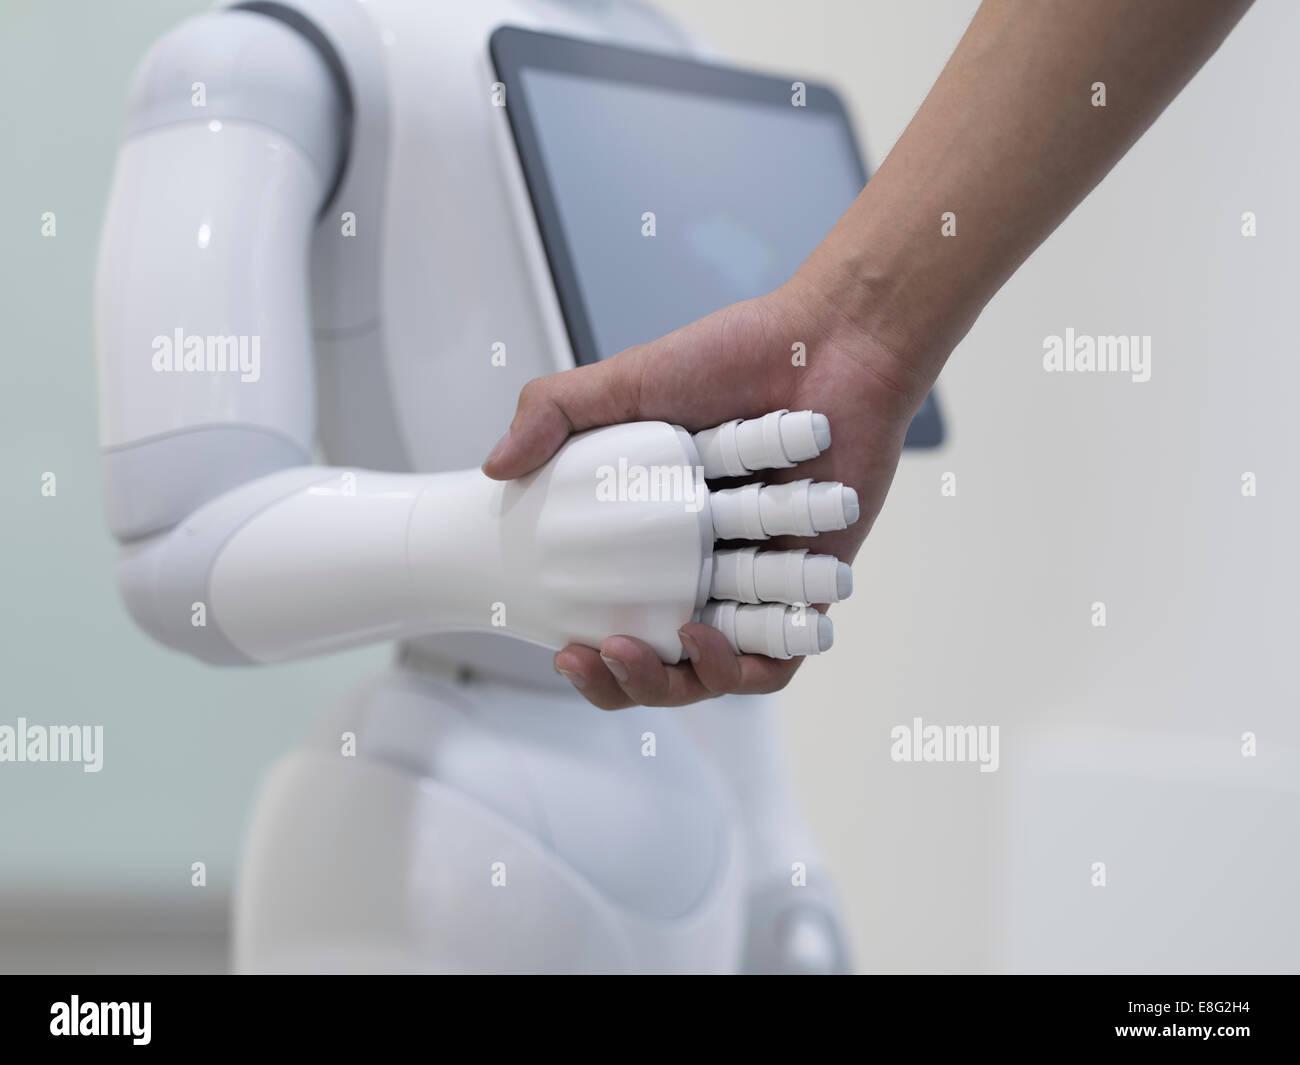 Pepper a humanoid robot by Aldebaran Robotics and SoftBank Mobile. At the Aoyama Softbank Store, Tokyo, Japan. - Stock Image